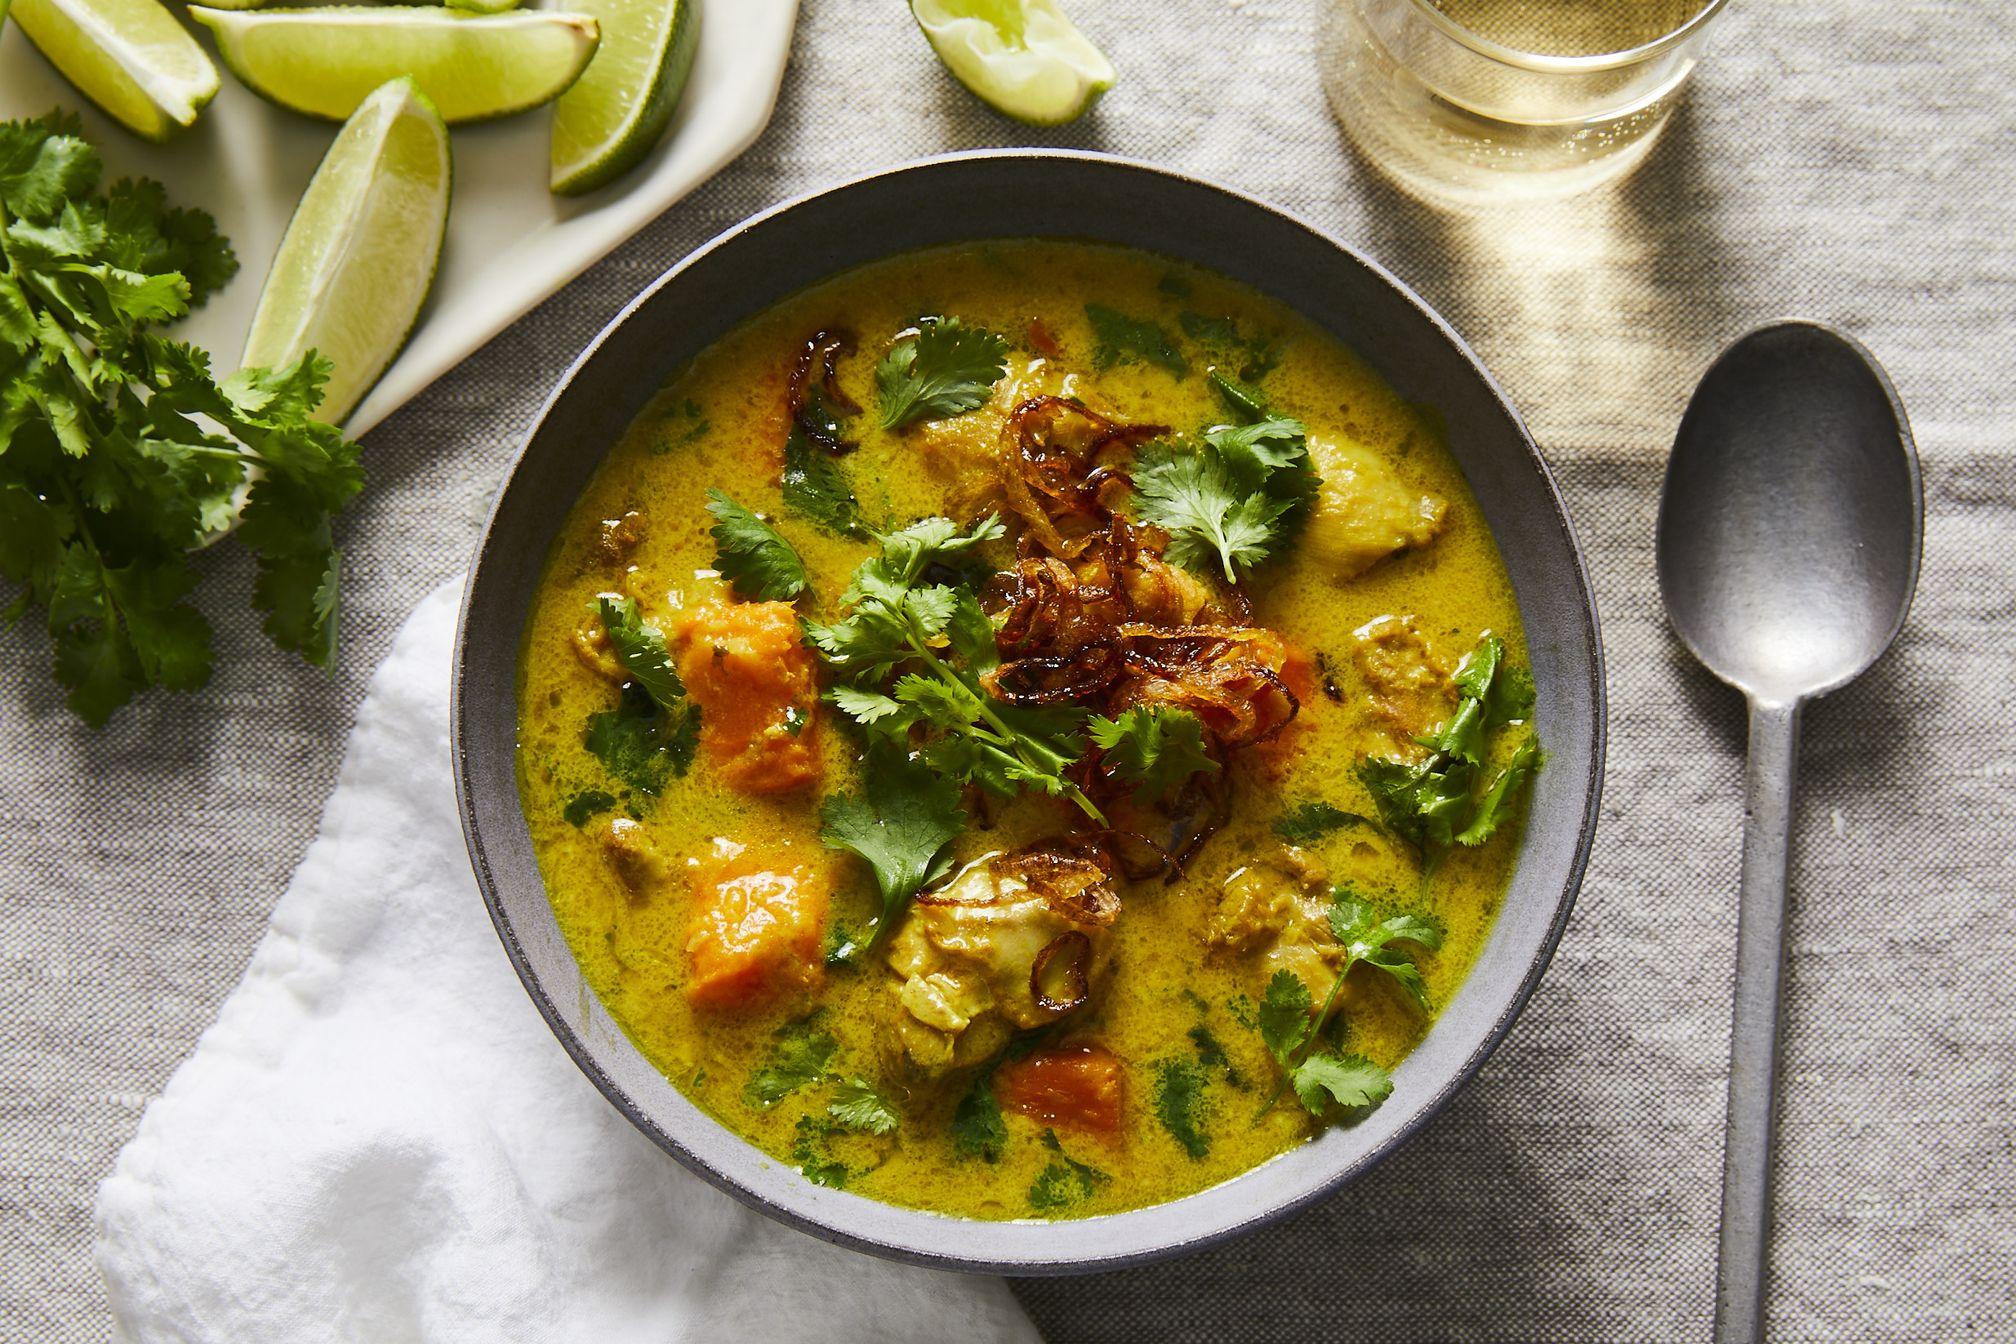 Burmese Inspired Chicken Braised In Coconut Milk Turmeric With Sweet Potato